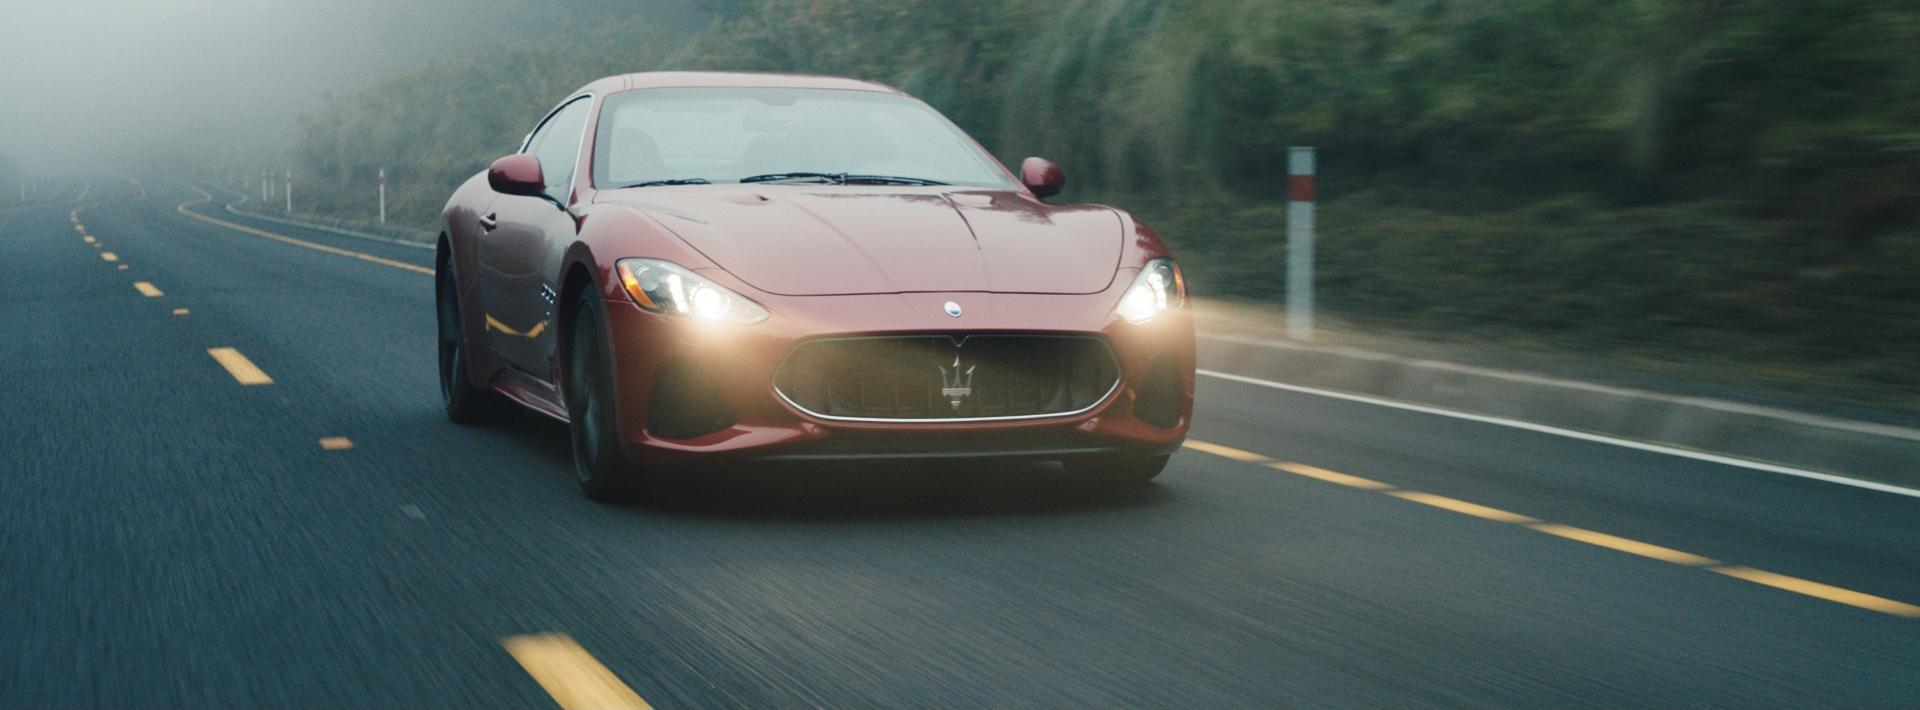 Maserati_1.108.1 copy.jpg